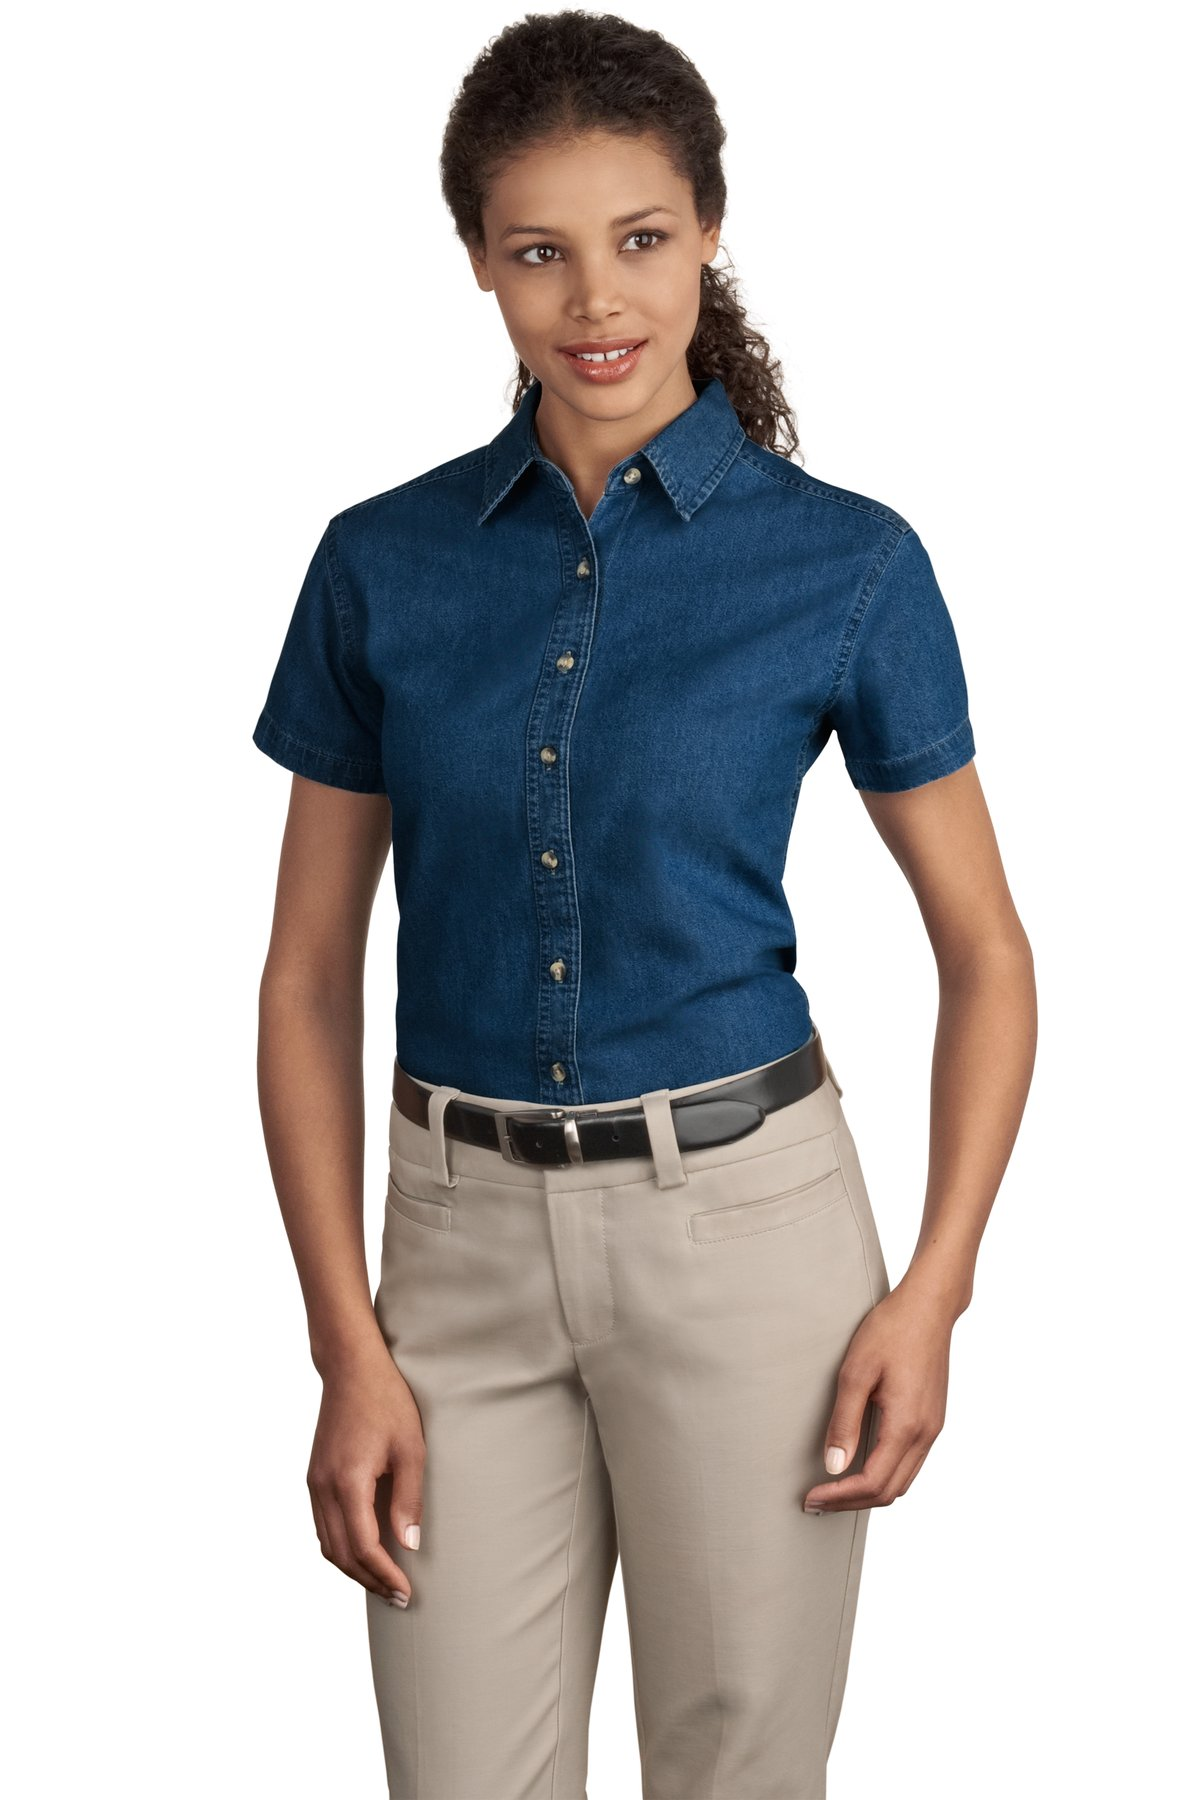 Woven-Shirts-Cotton-7